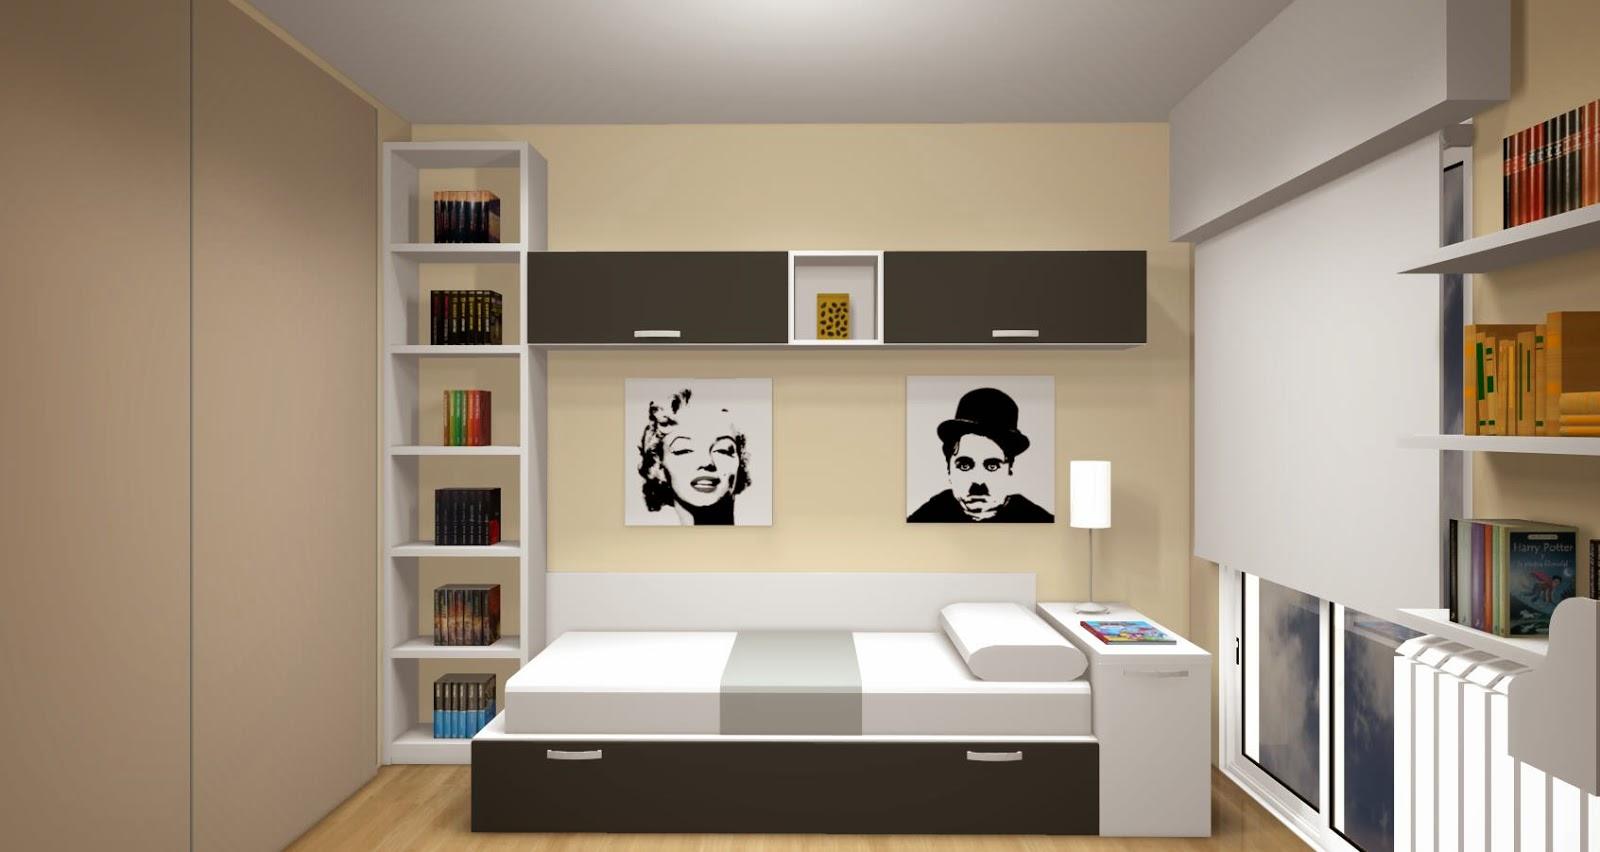 Dormitorio Juvenil Diseo Dormitorio Juvenil Perfect Dormitorio  # Muebles Farucho